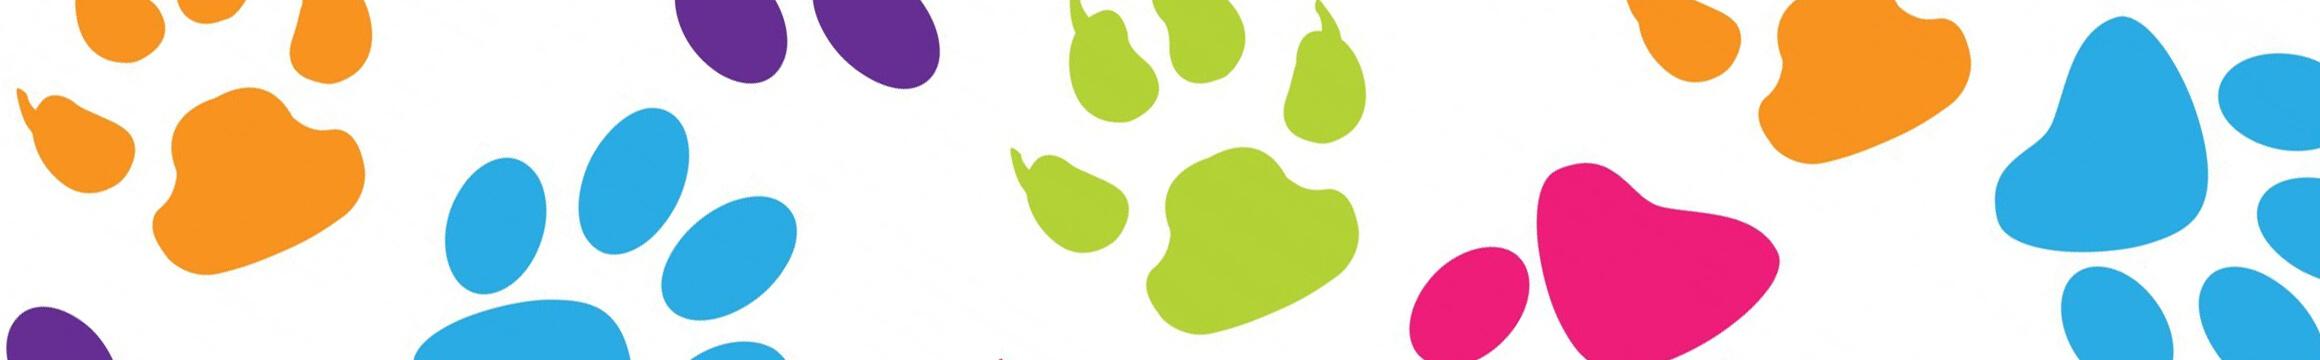 Animals Pets 10